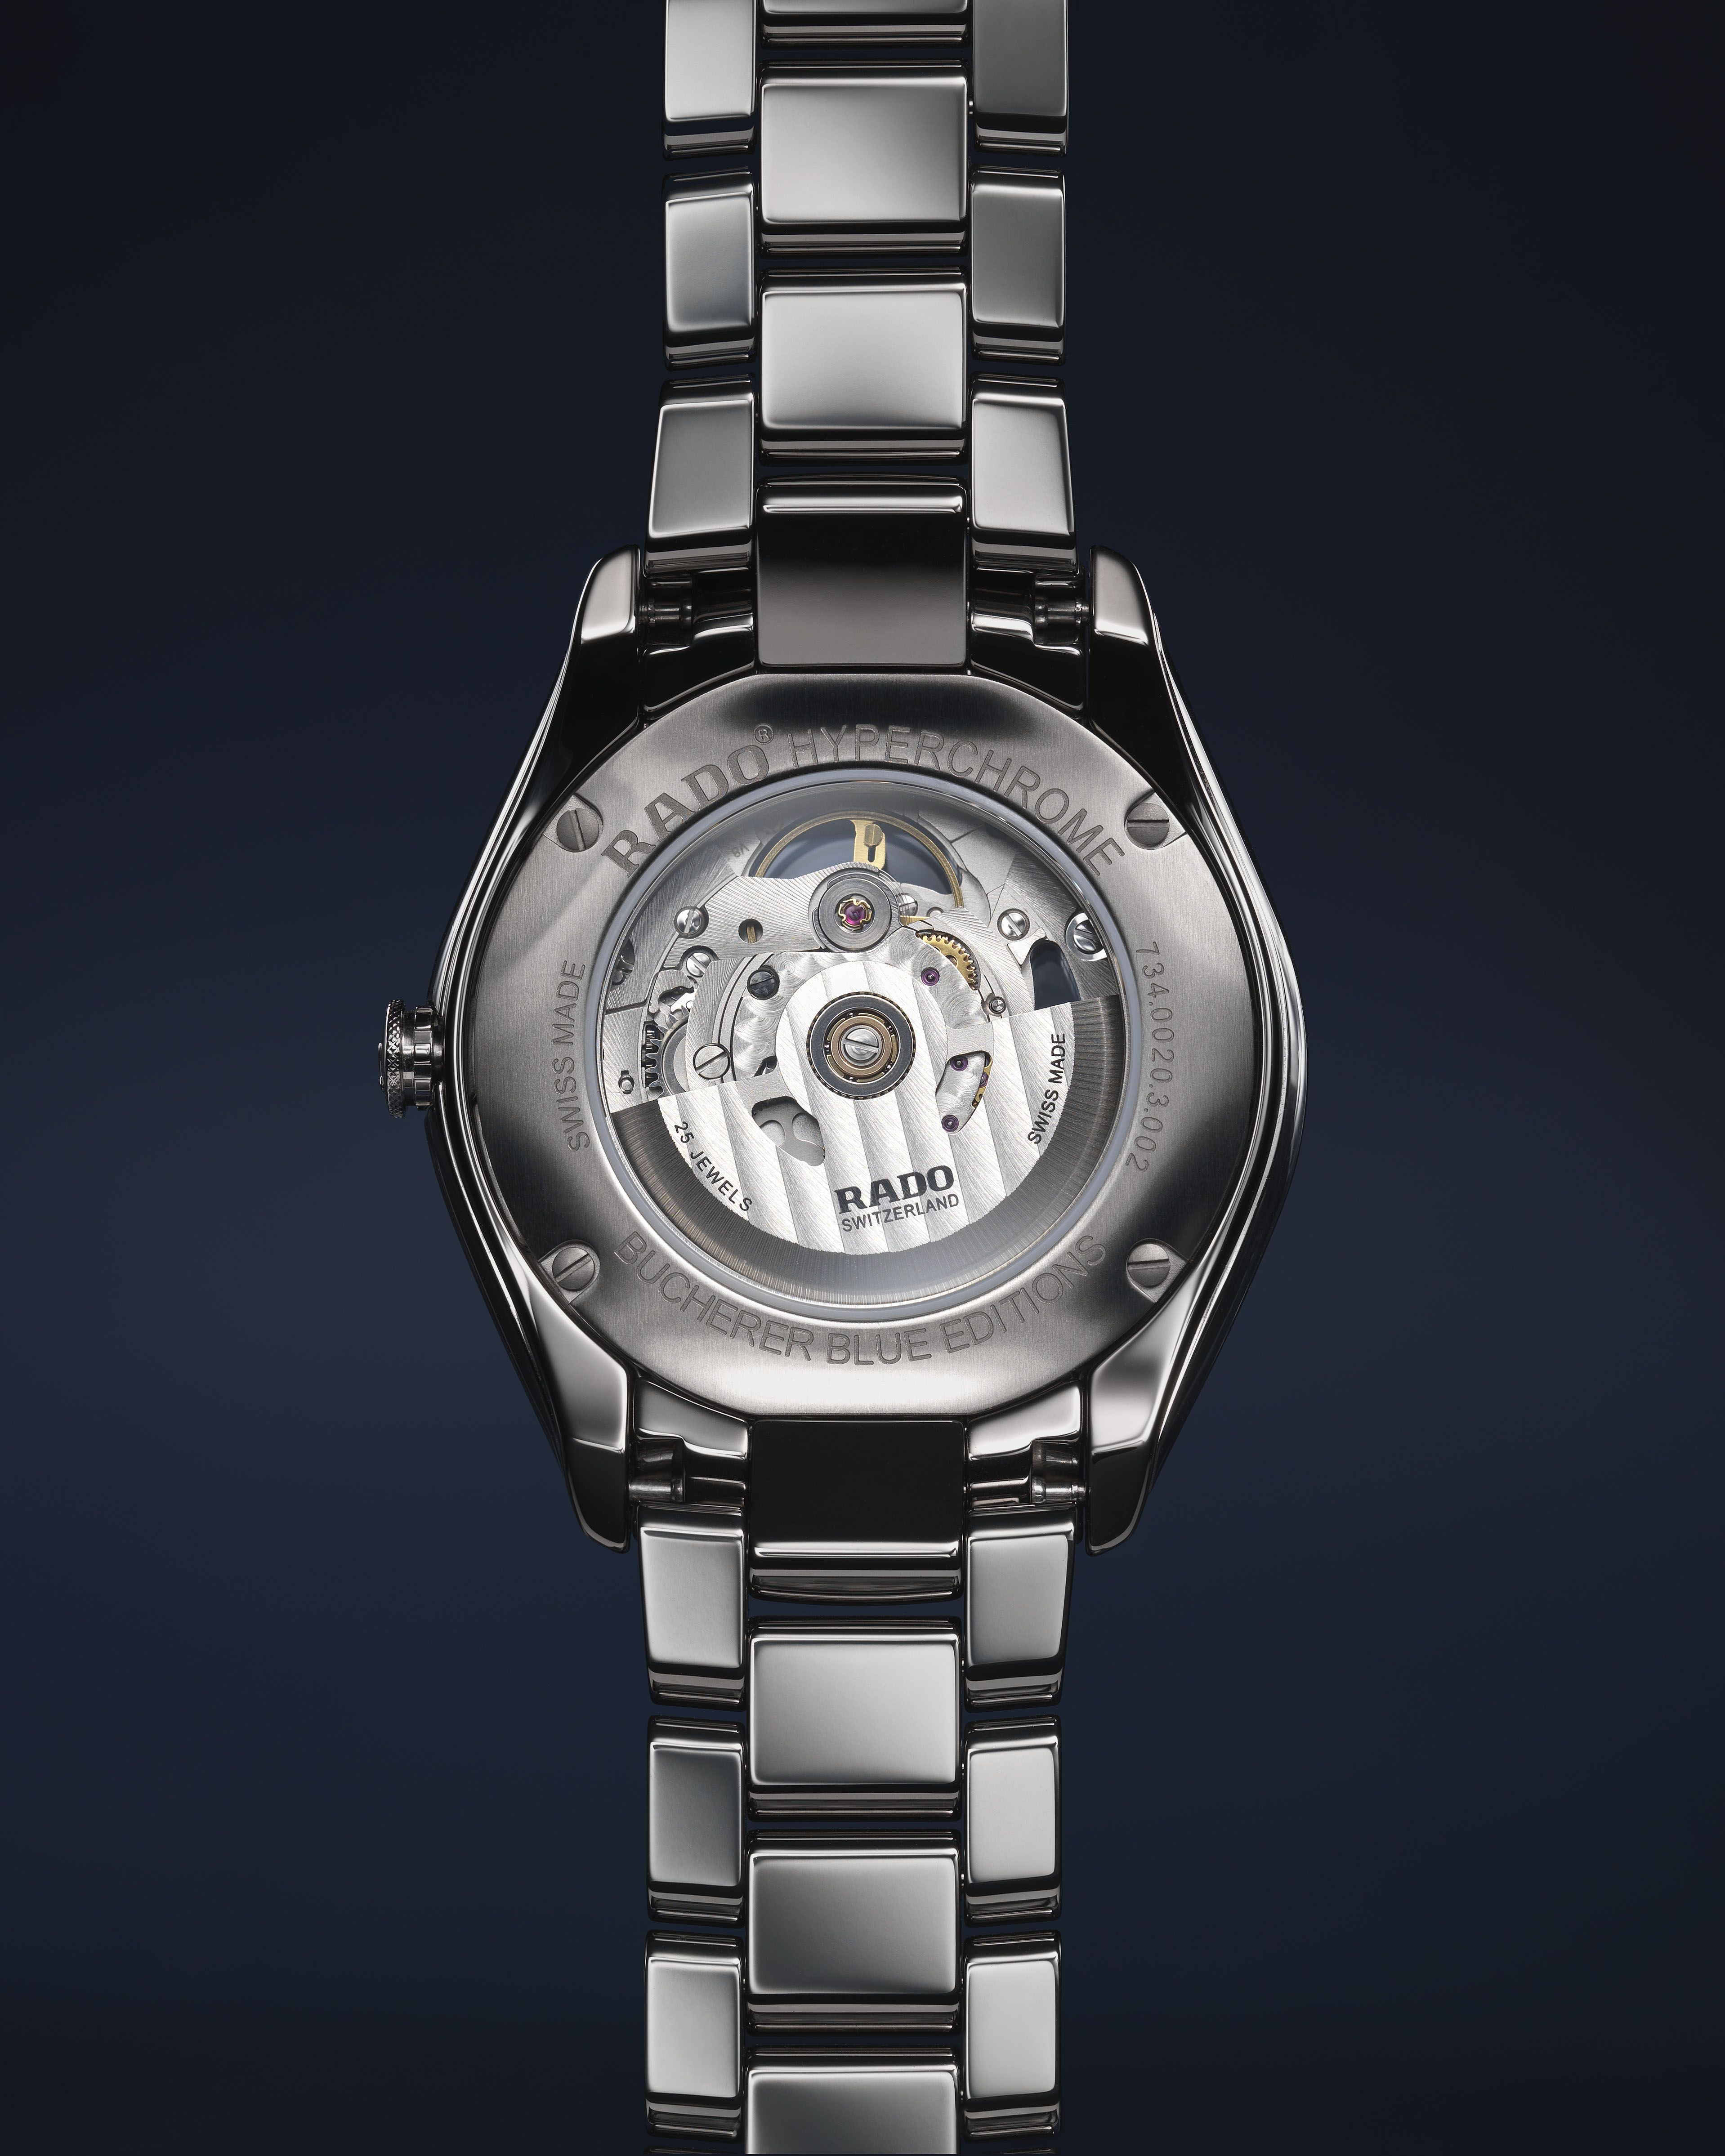 Rado Herrenchronograph Hyperchrome